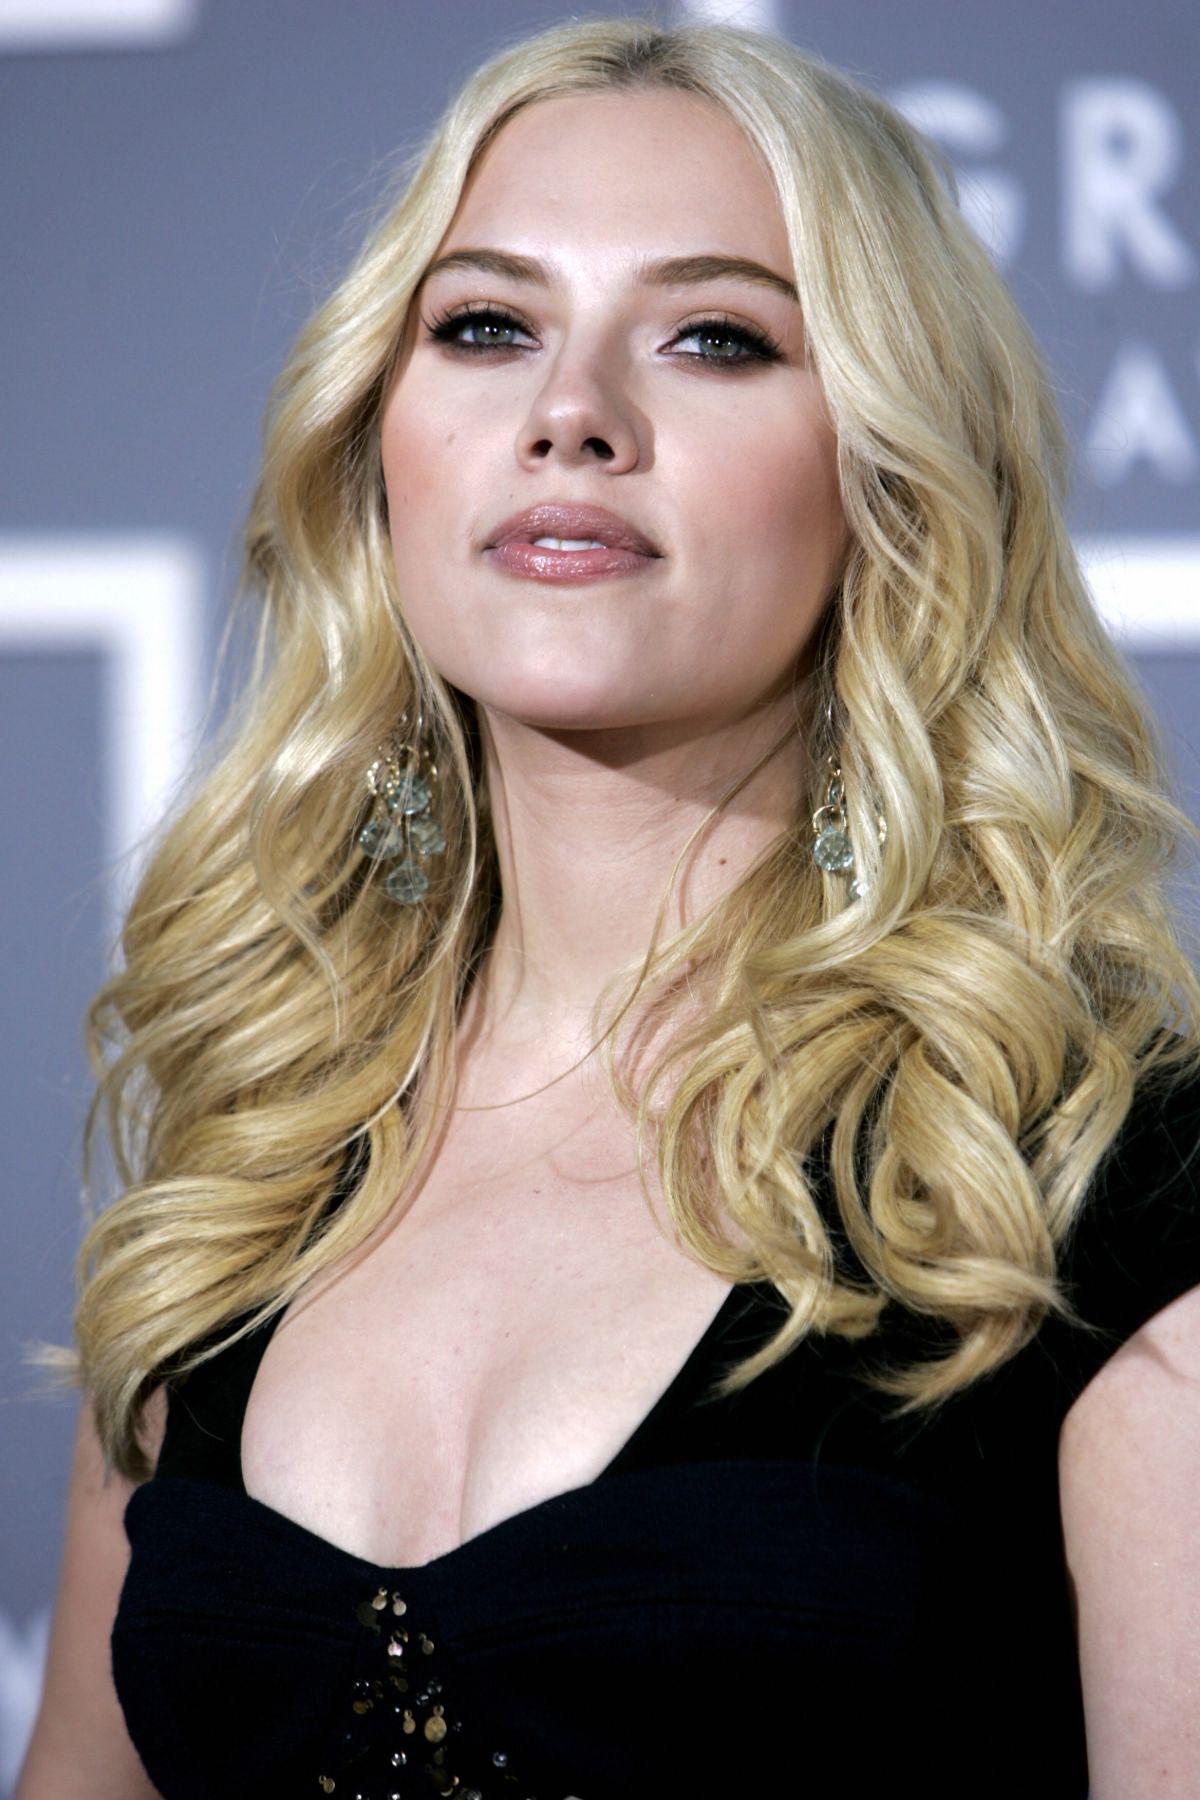 Scarlett Johansson pics 2012